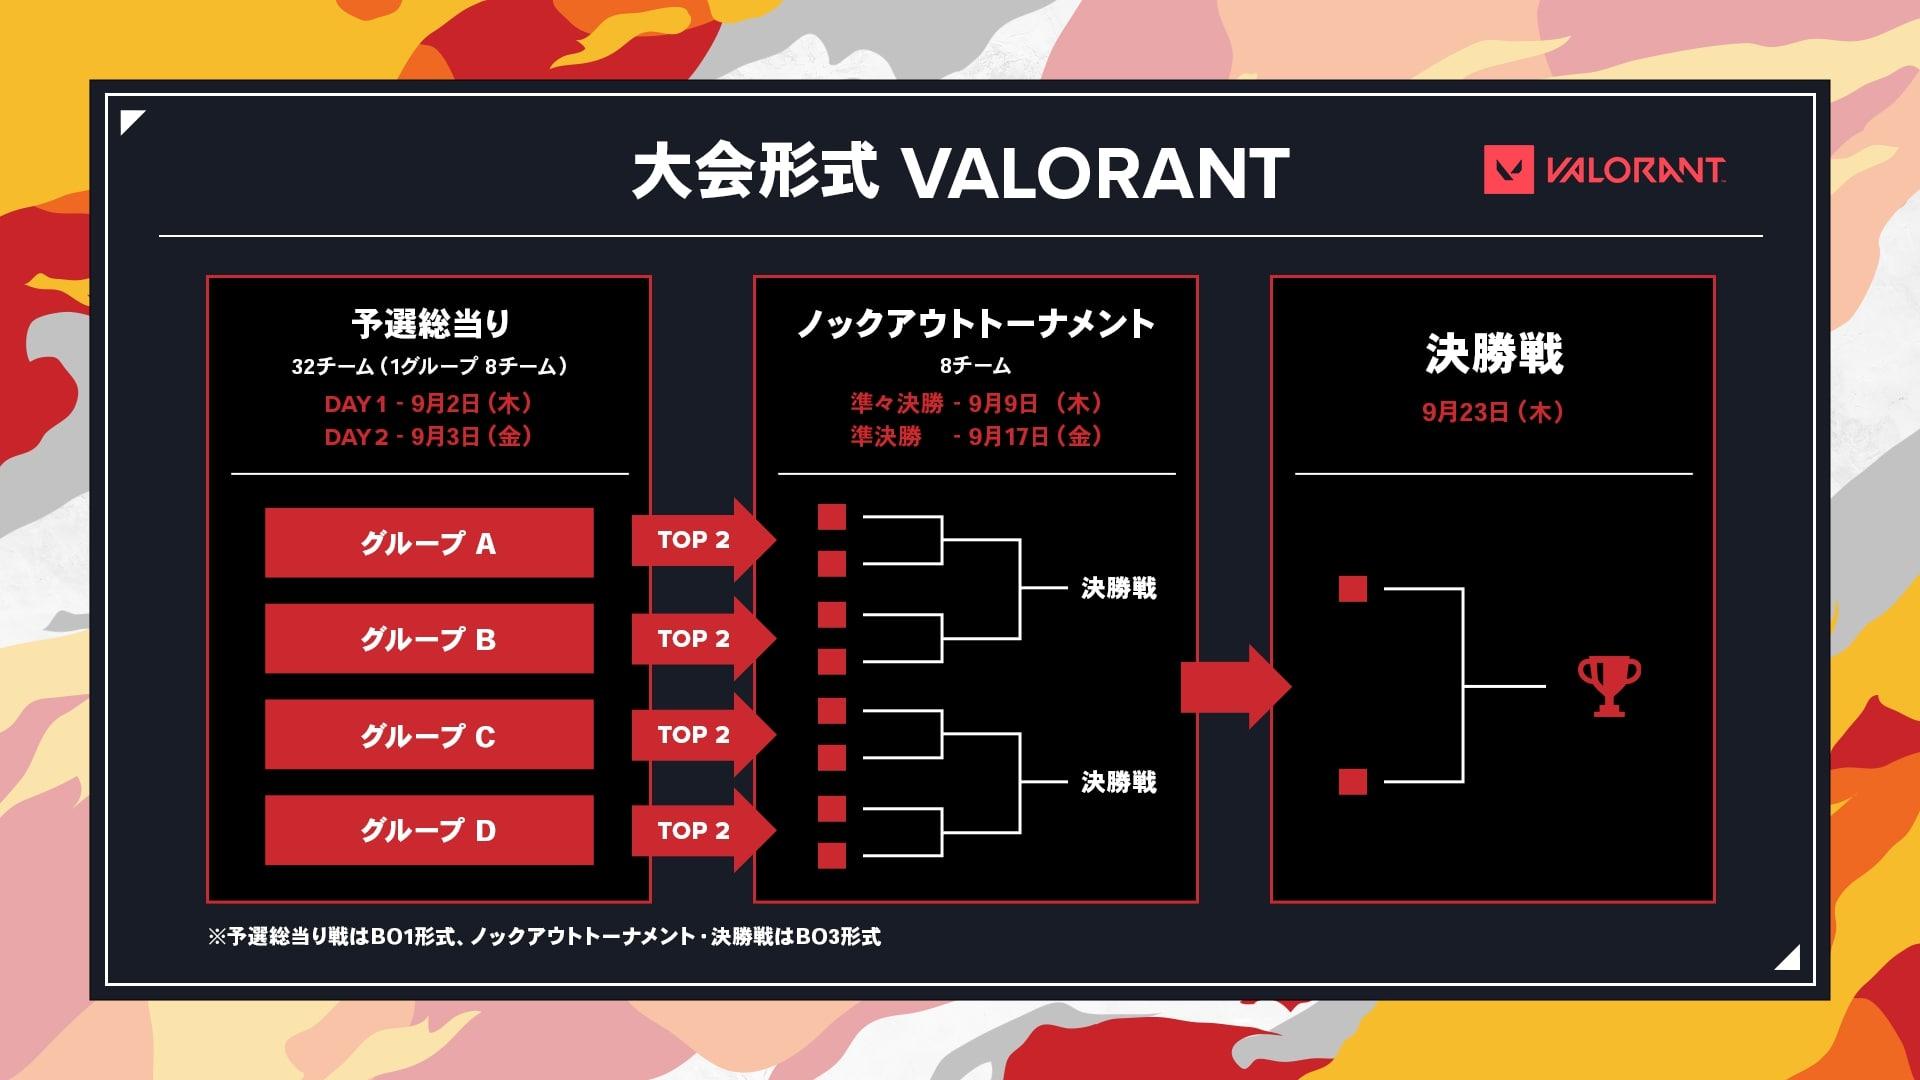 JCC-2021_大会形式-VALORANT_210812.jpg